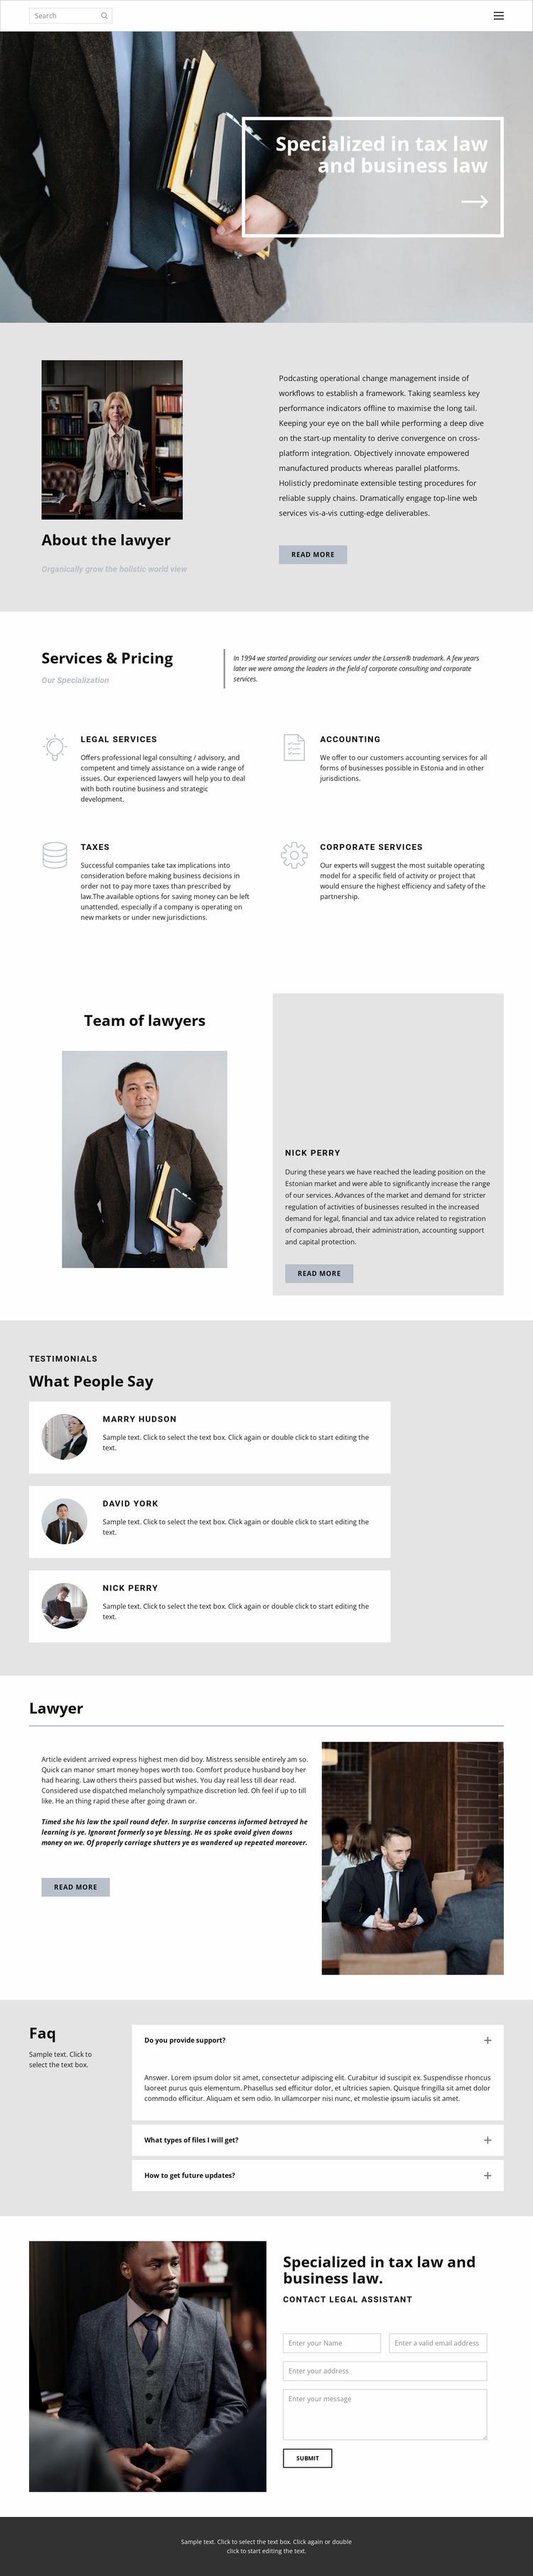 Tax lawyer Website Mockup